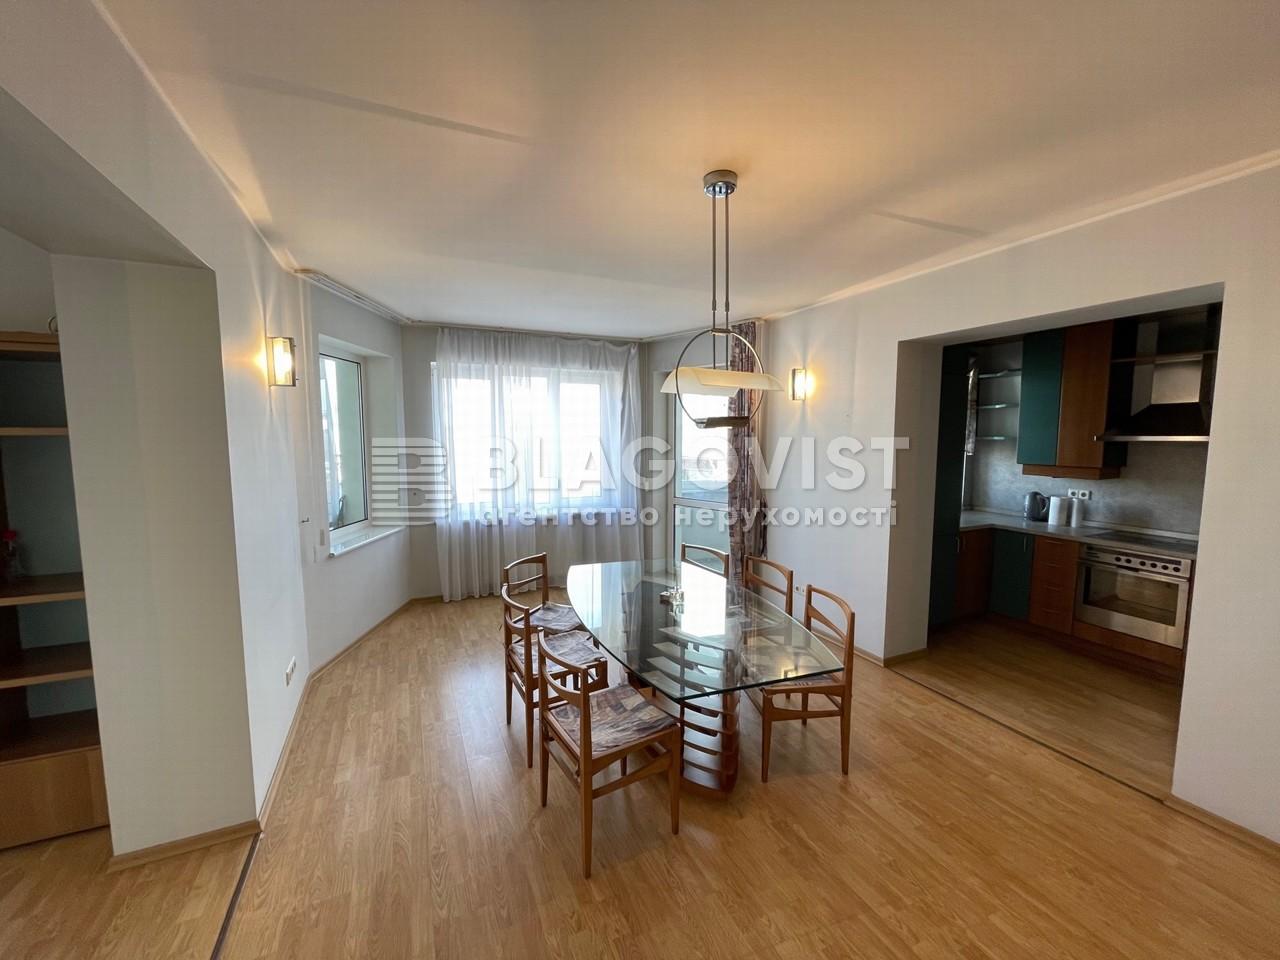 Квартира E-40979, Гордиенко Костя пер. (Чекистов пер.), 2а, Киев - Фото 9